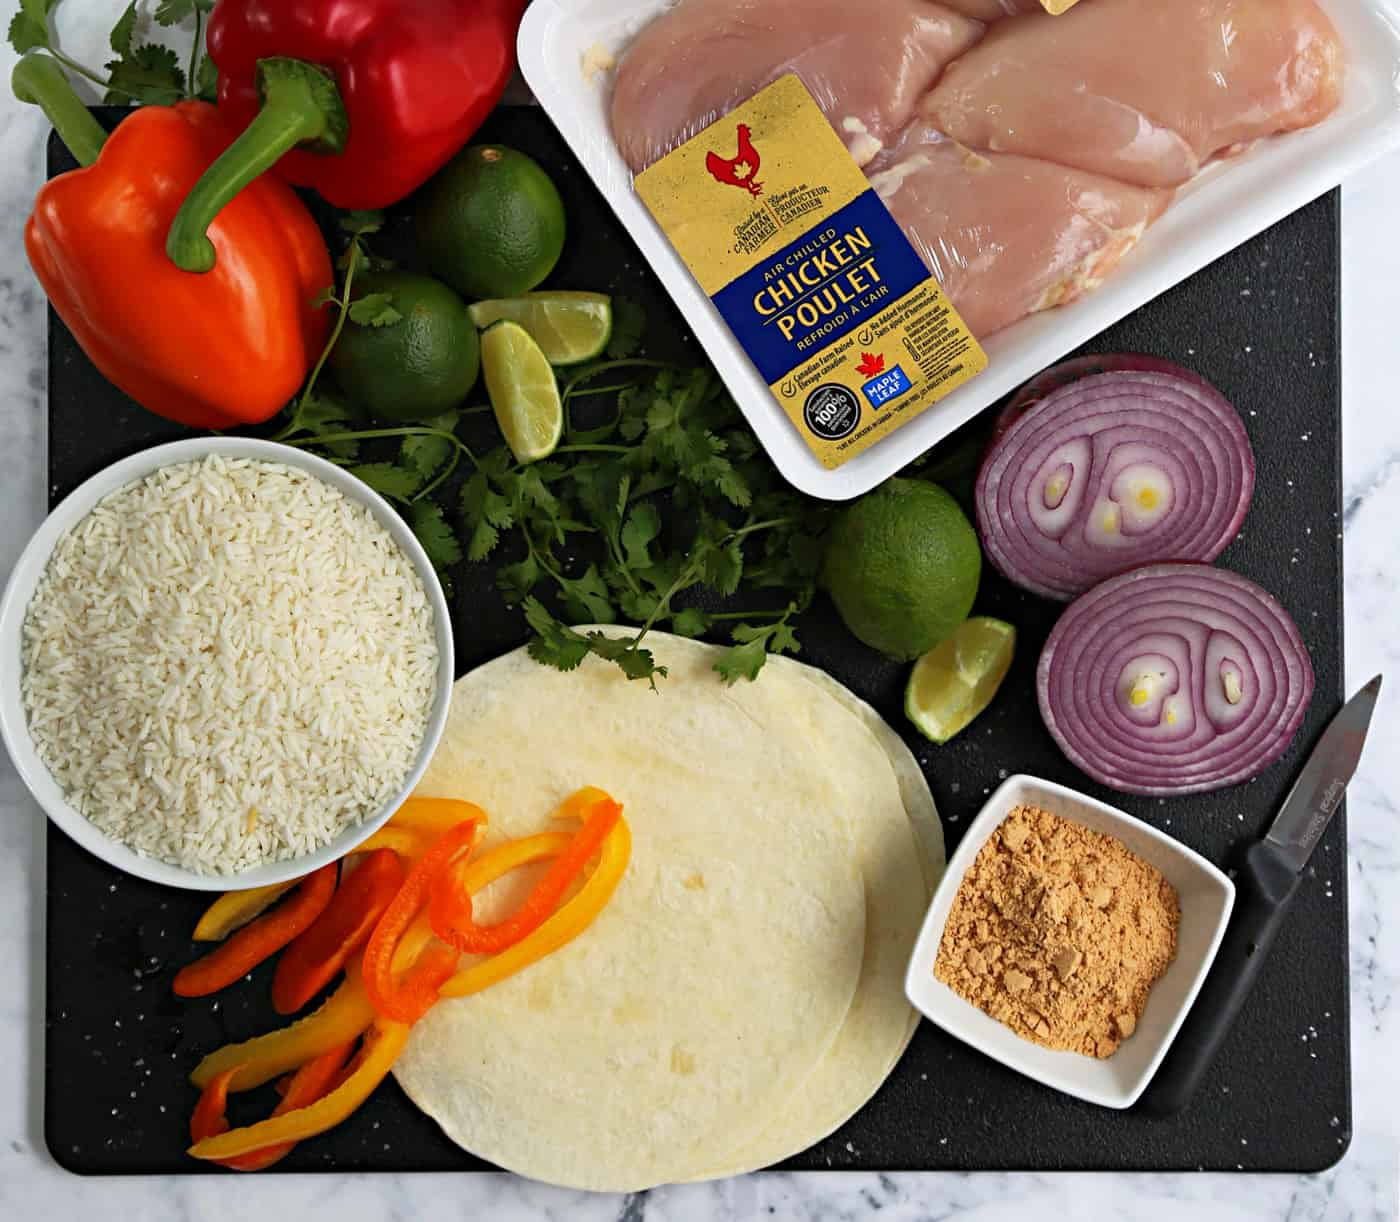 ingredients to make Chicken Fajita Foil Packets